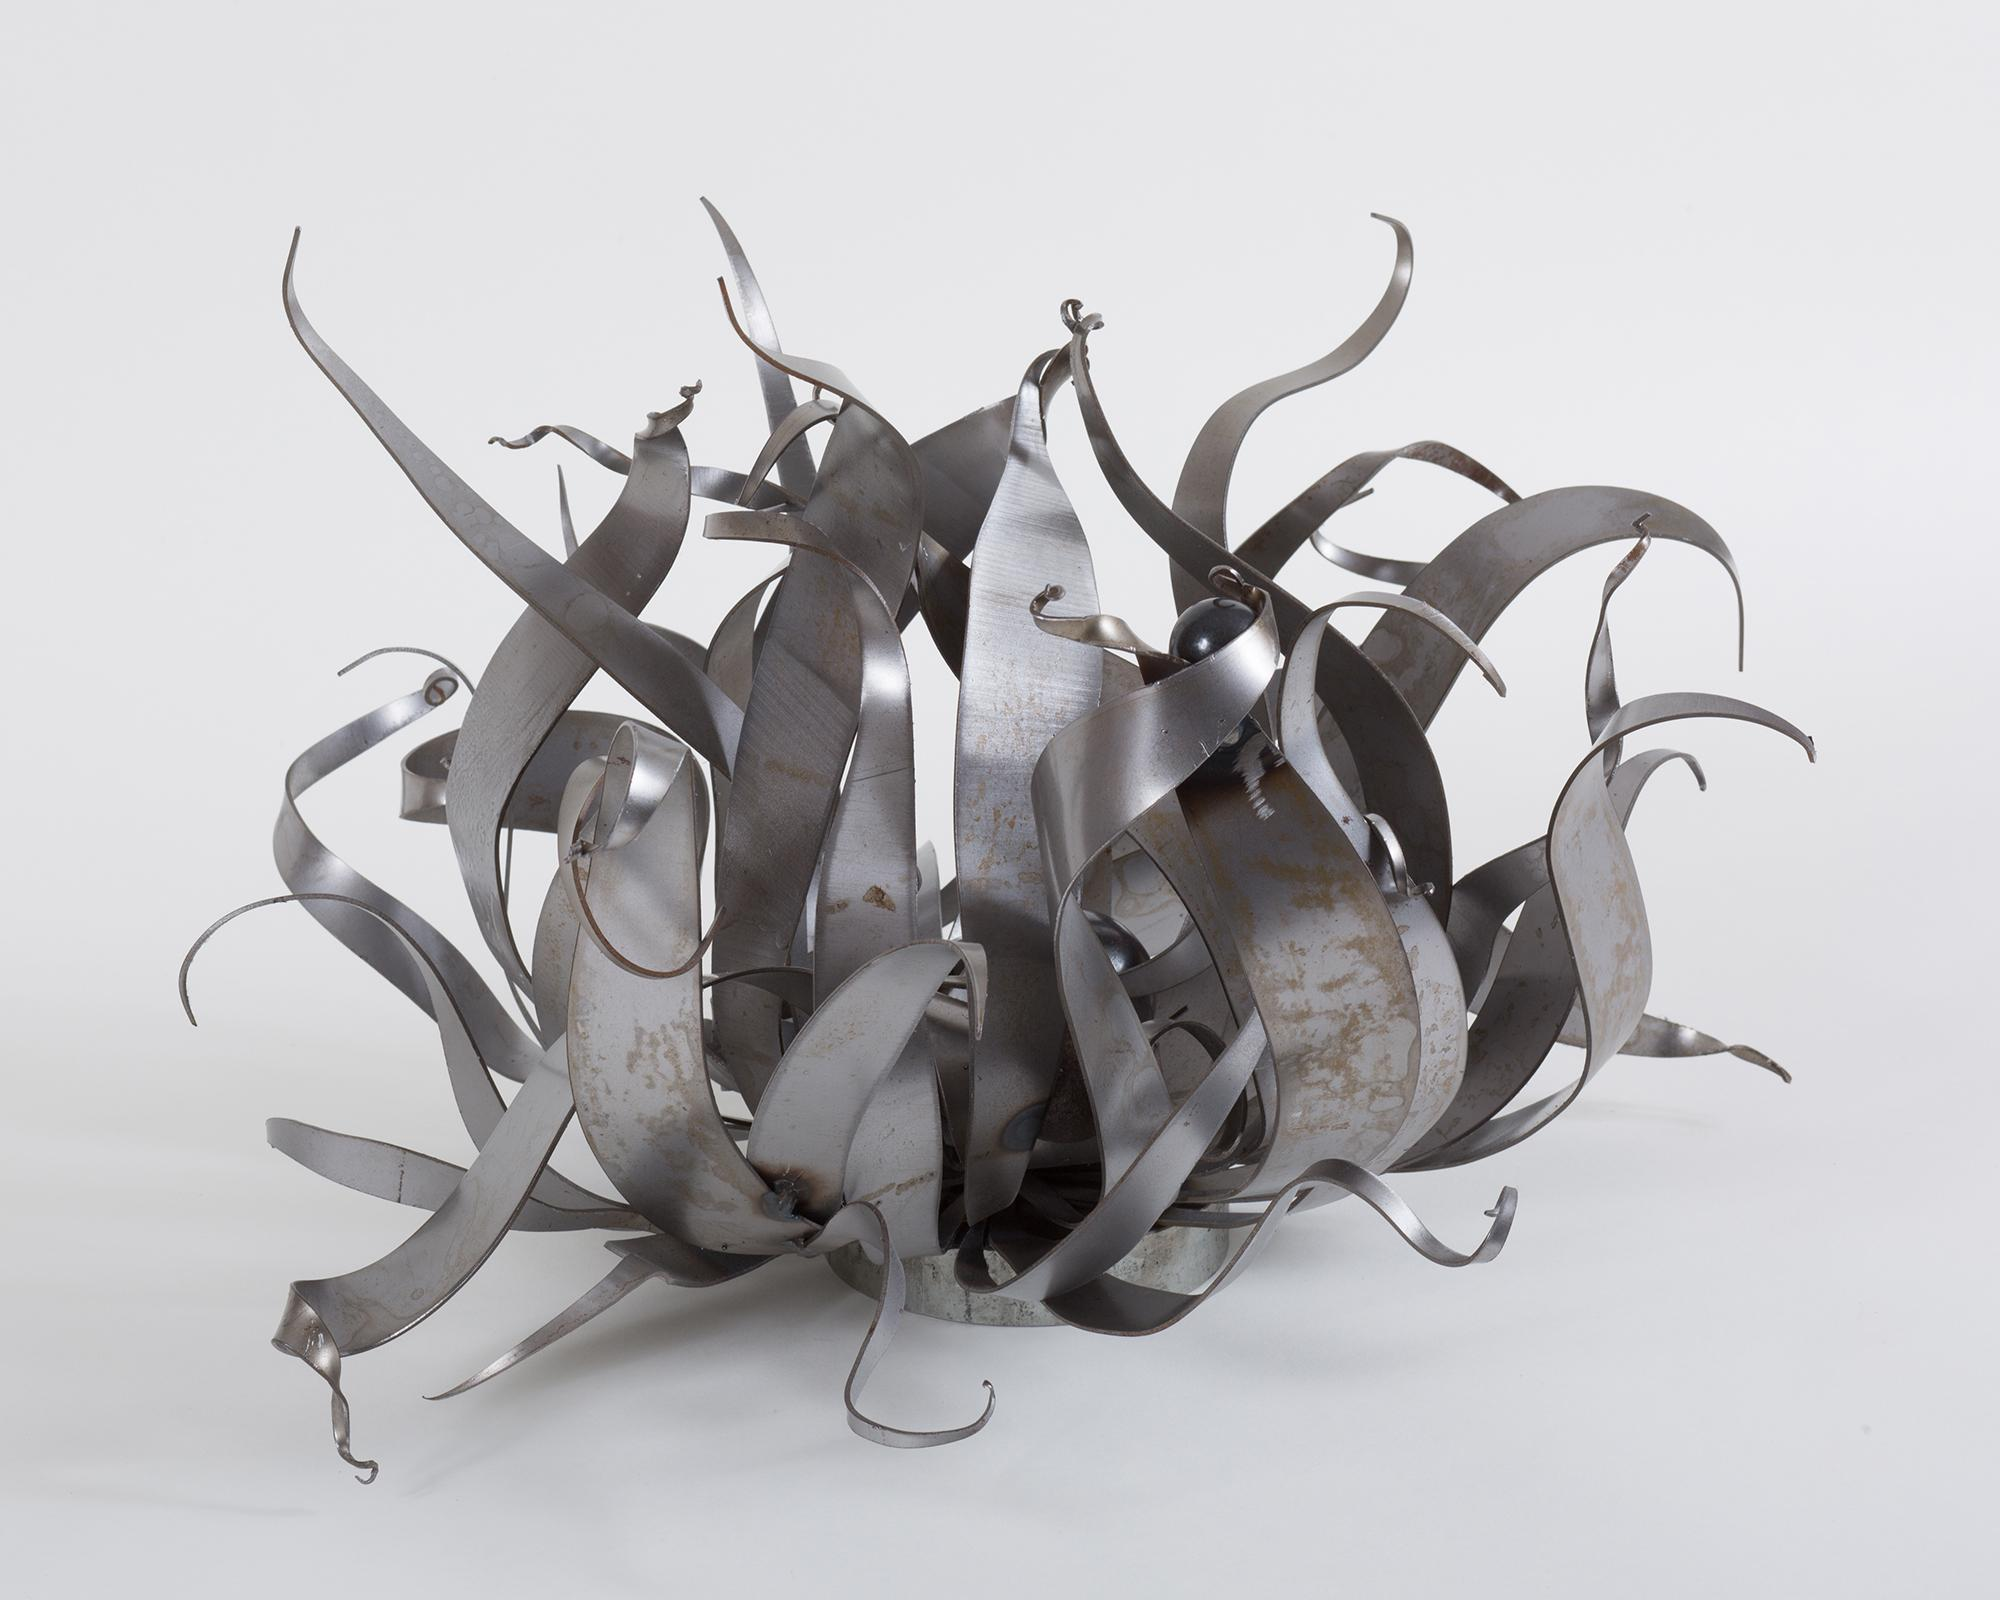 """Relentless"", steel, iron, sculpture, grassy shapes"